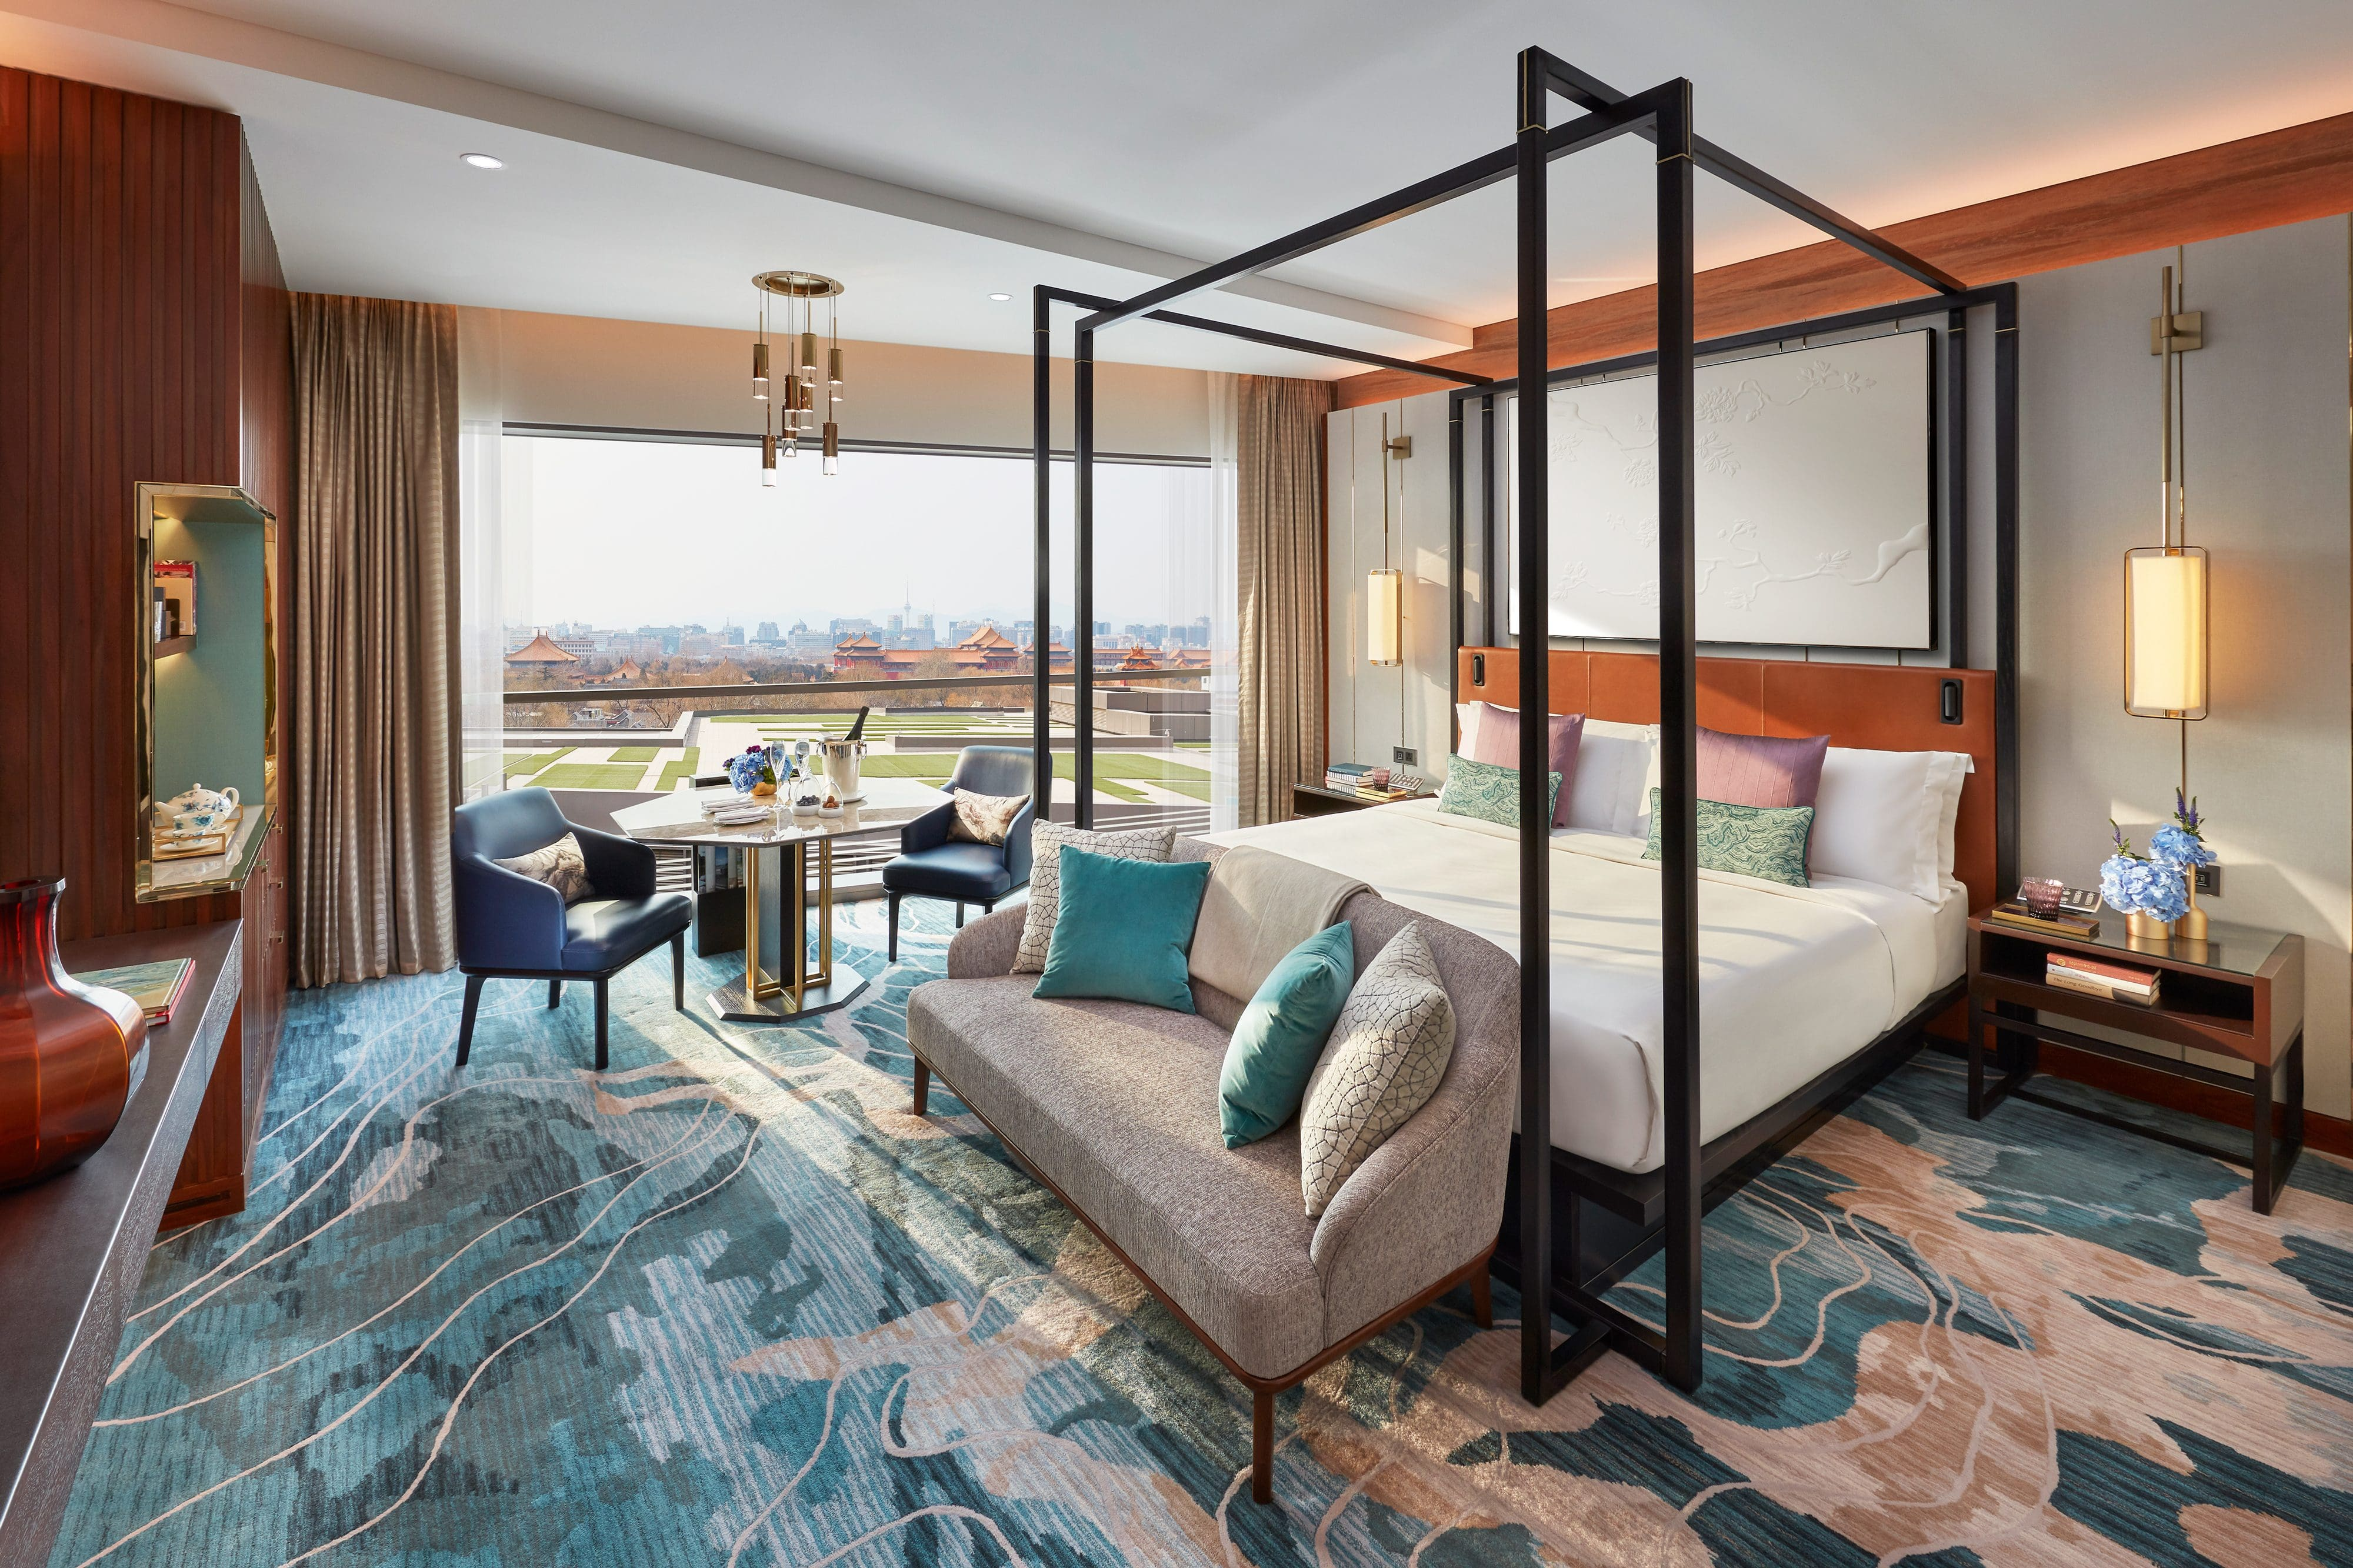 Interior of the Mandarin Room hotel suite at MO Wangfujing